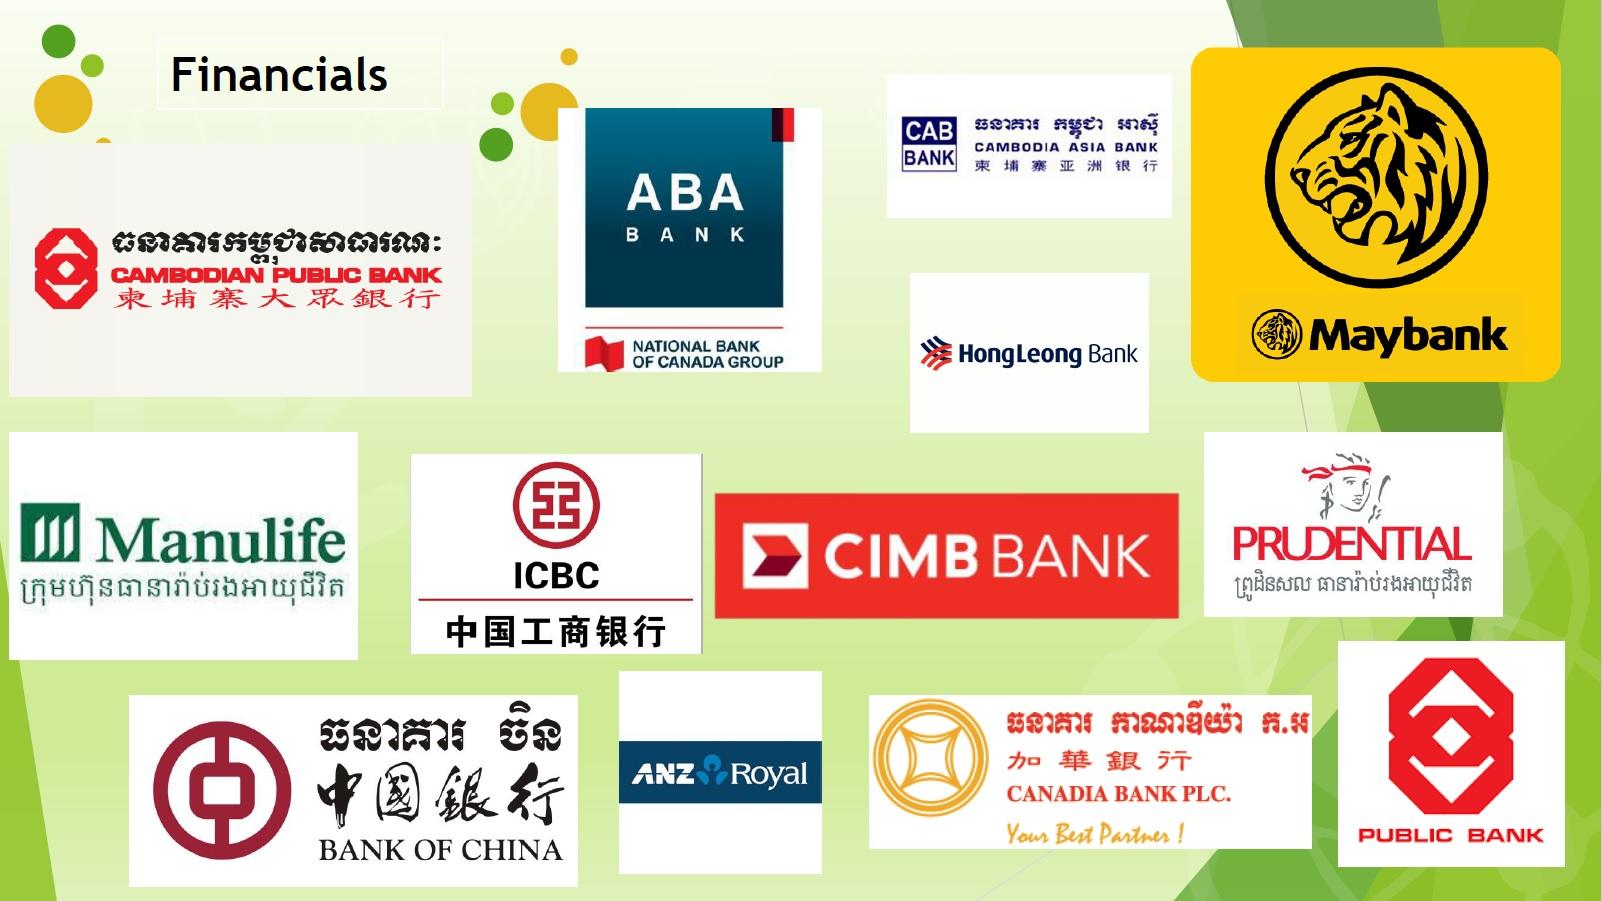 Financial Companies in Cambodia